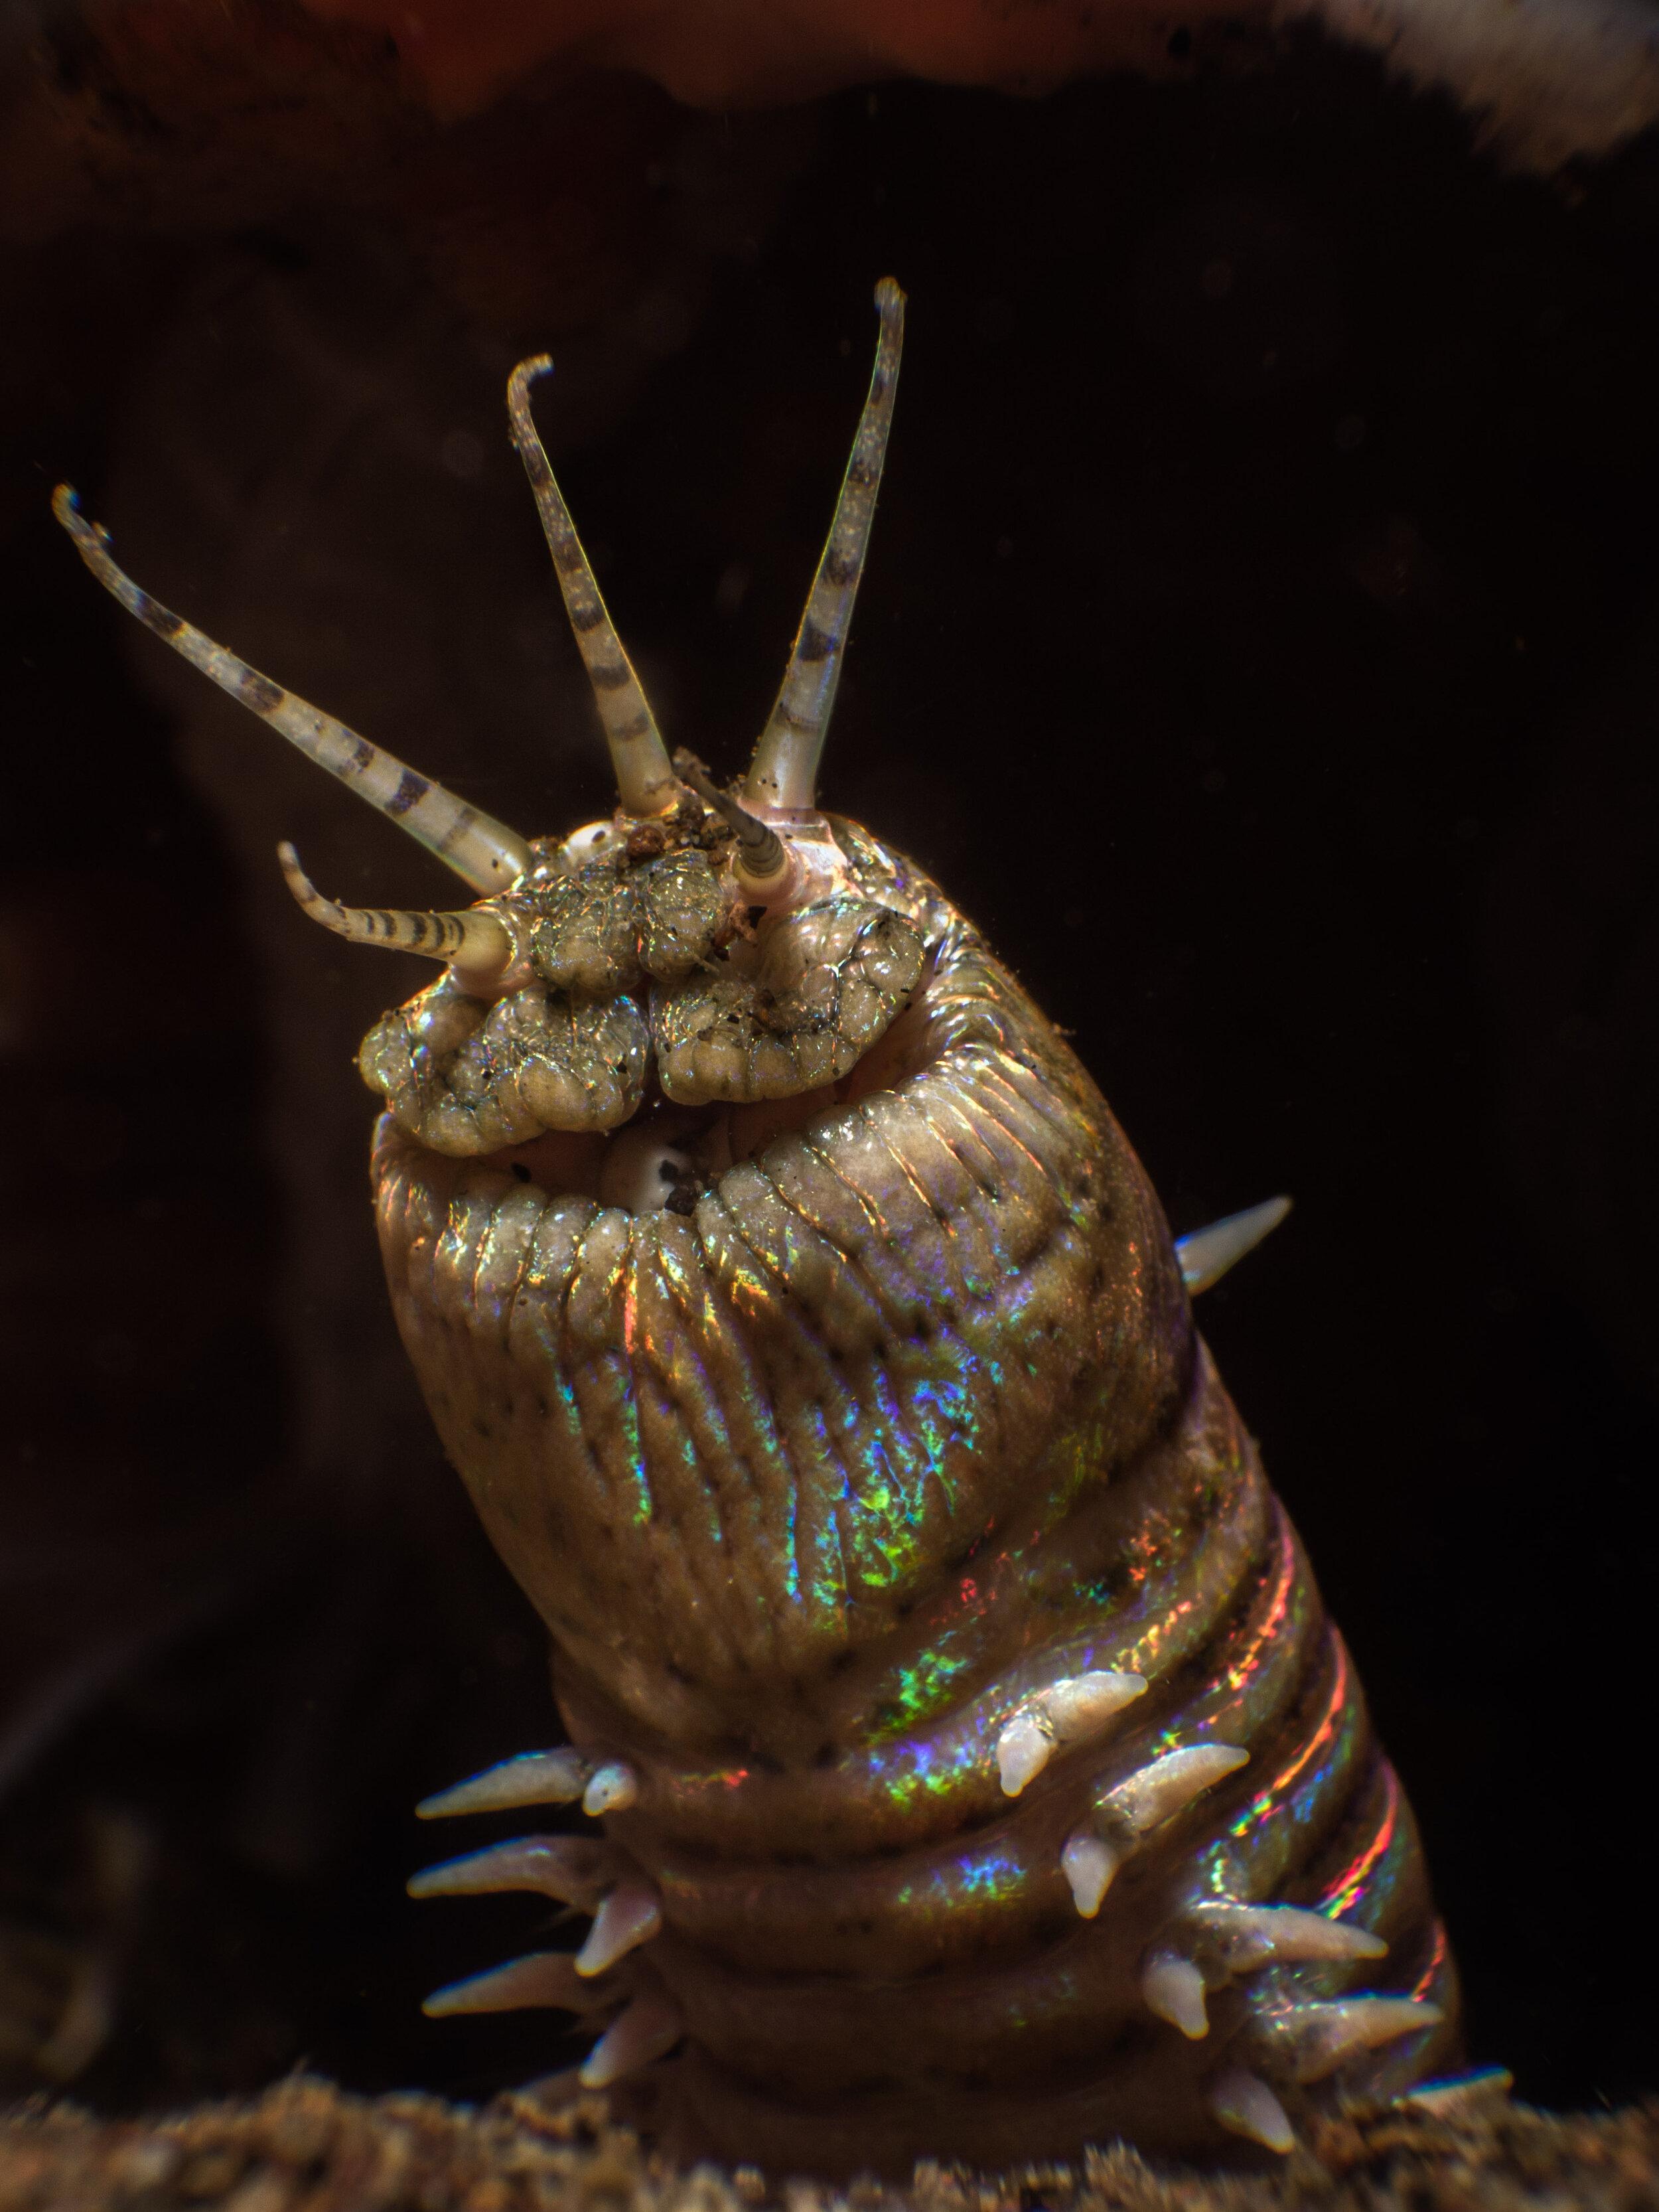 Bobbit worm  (Eunice aphroditois)